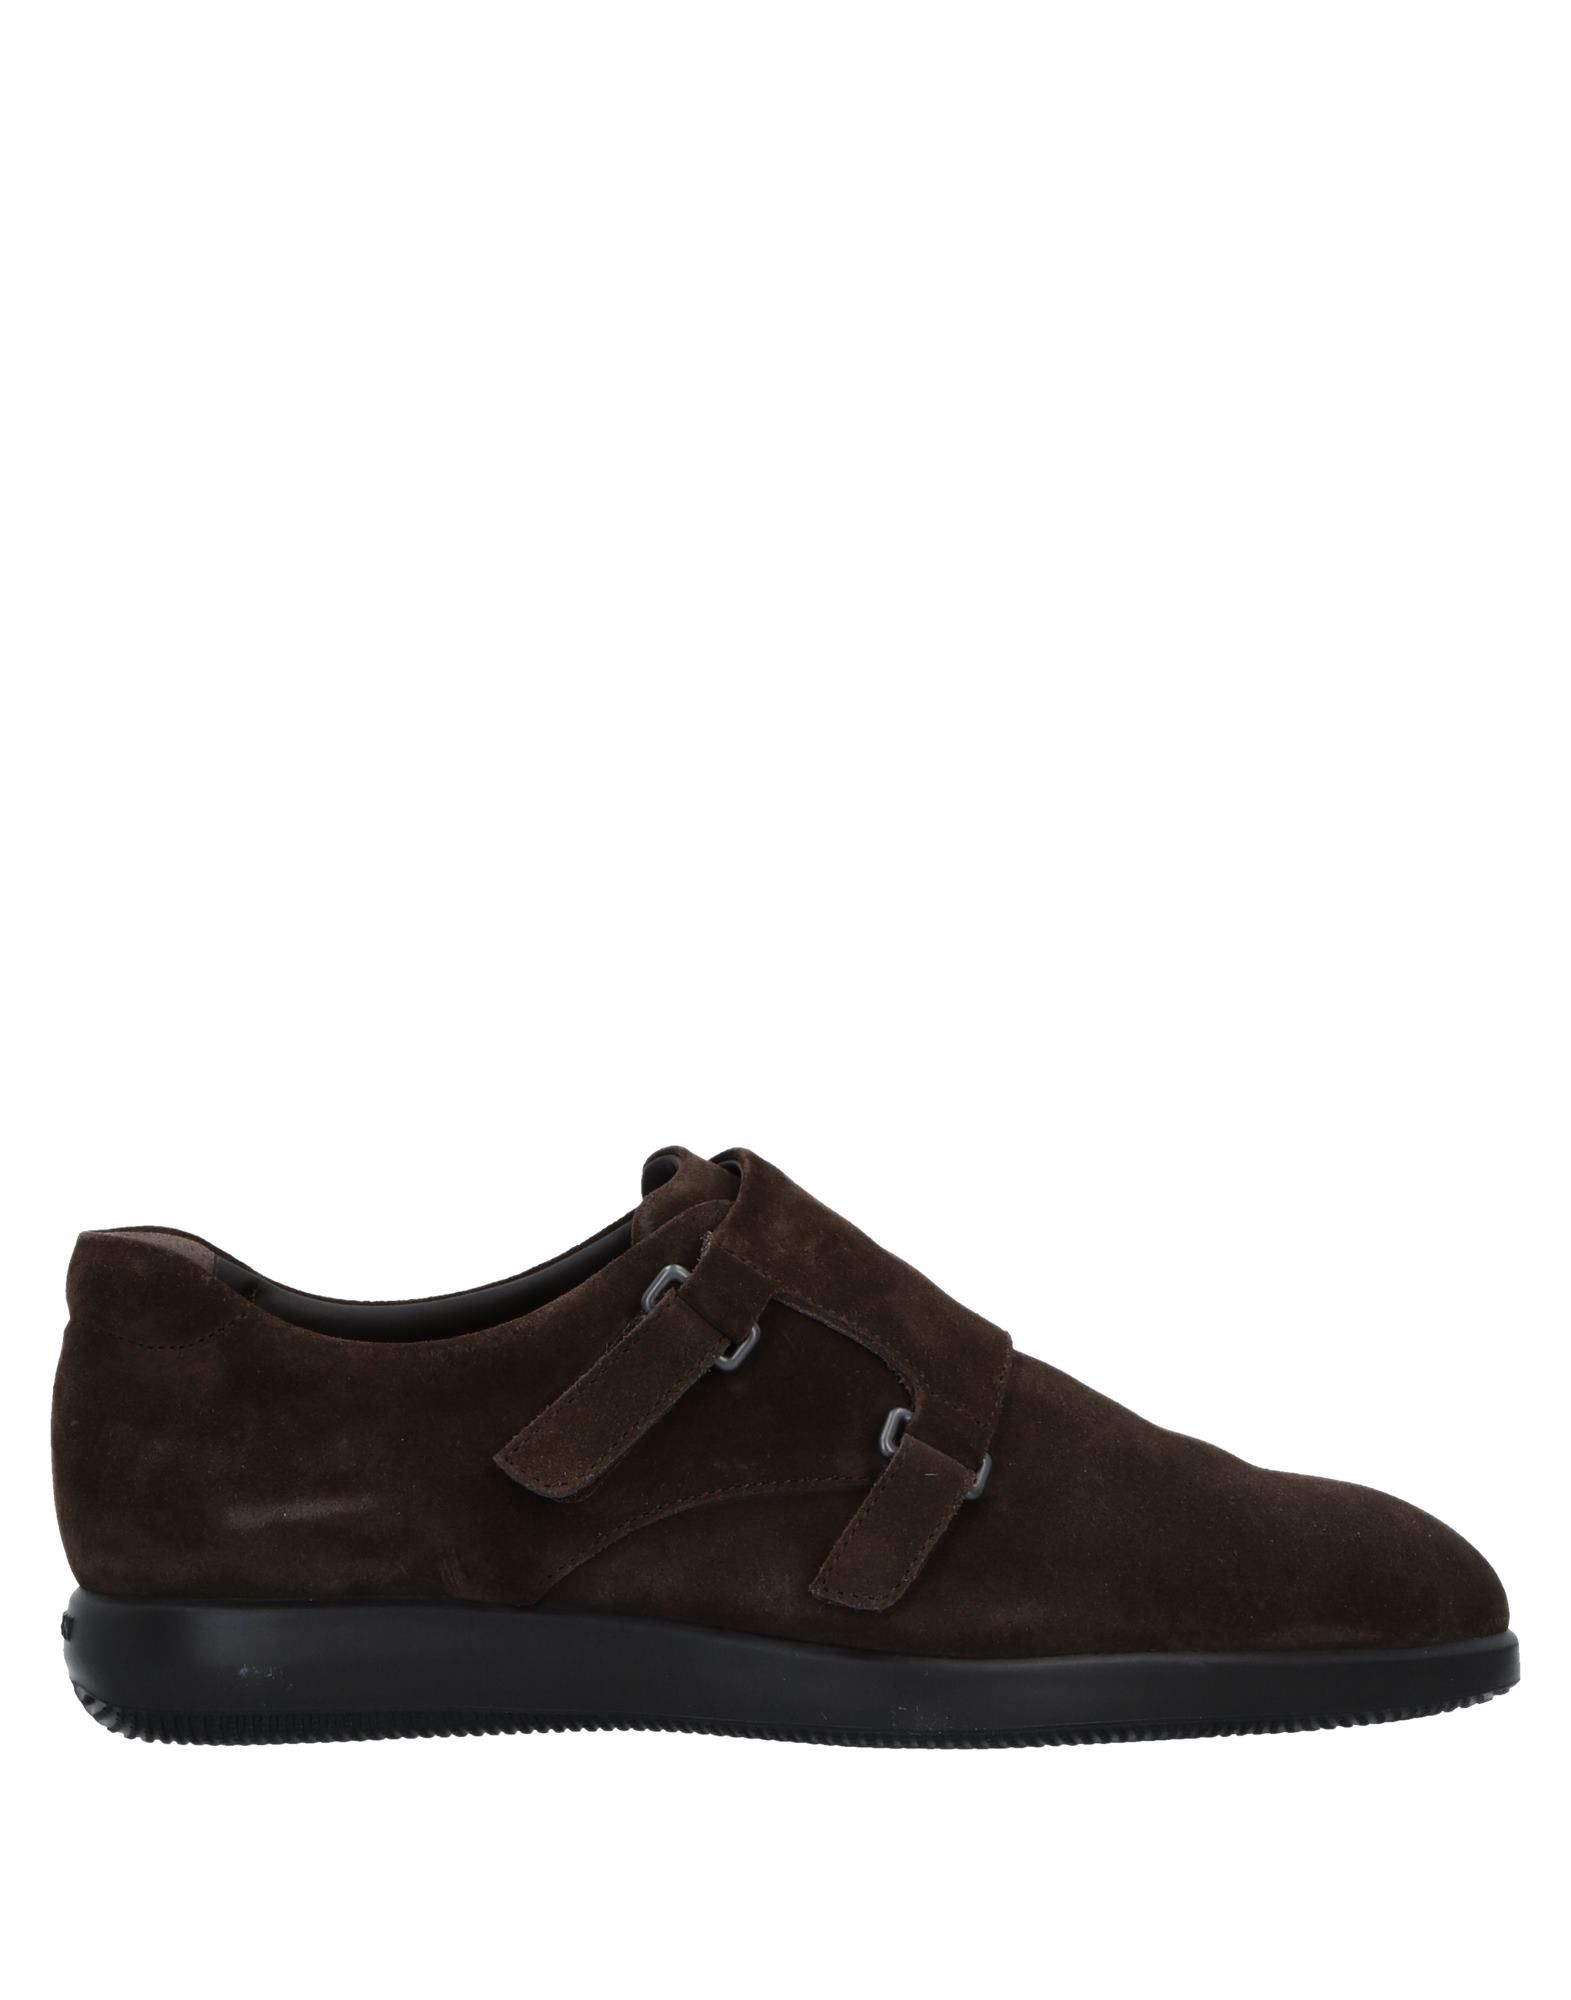 Hogan Mokassins Herren  11540985UV Gute Qualität beliebte Schuhe